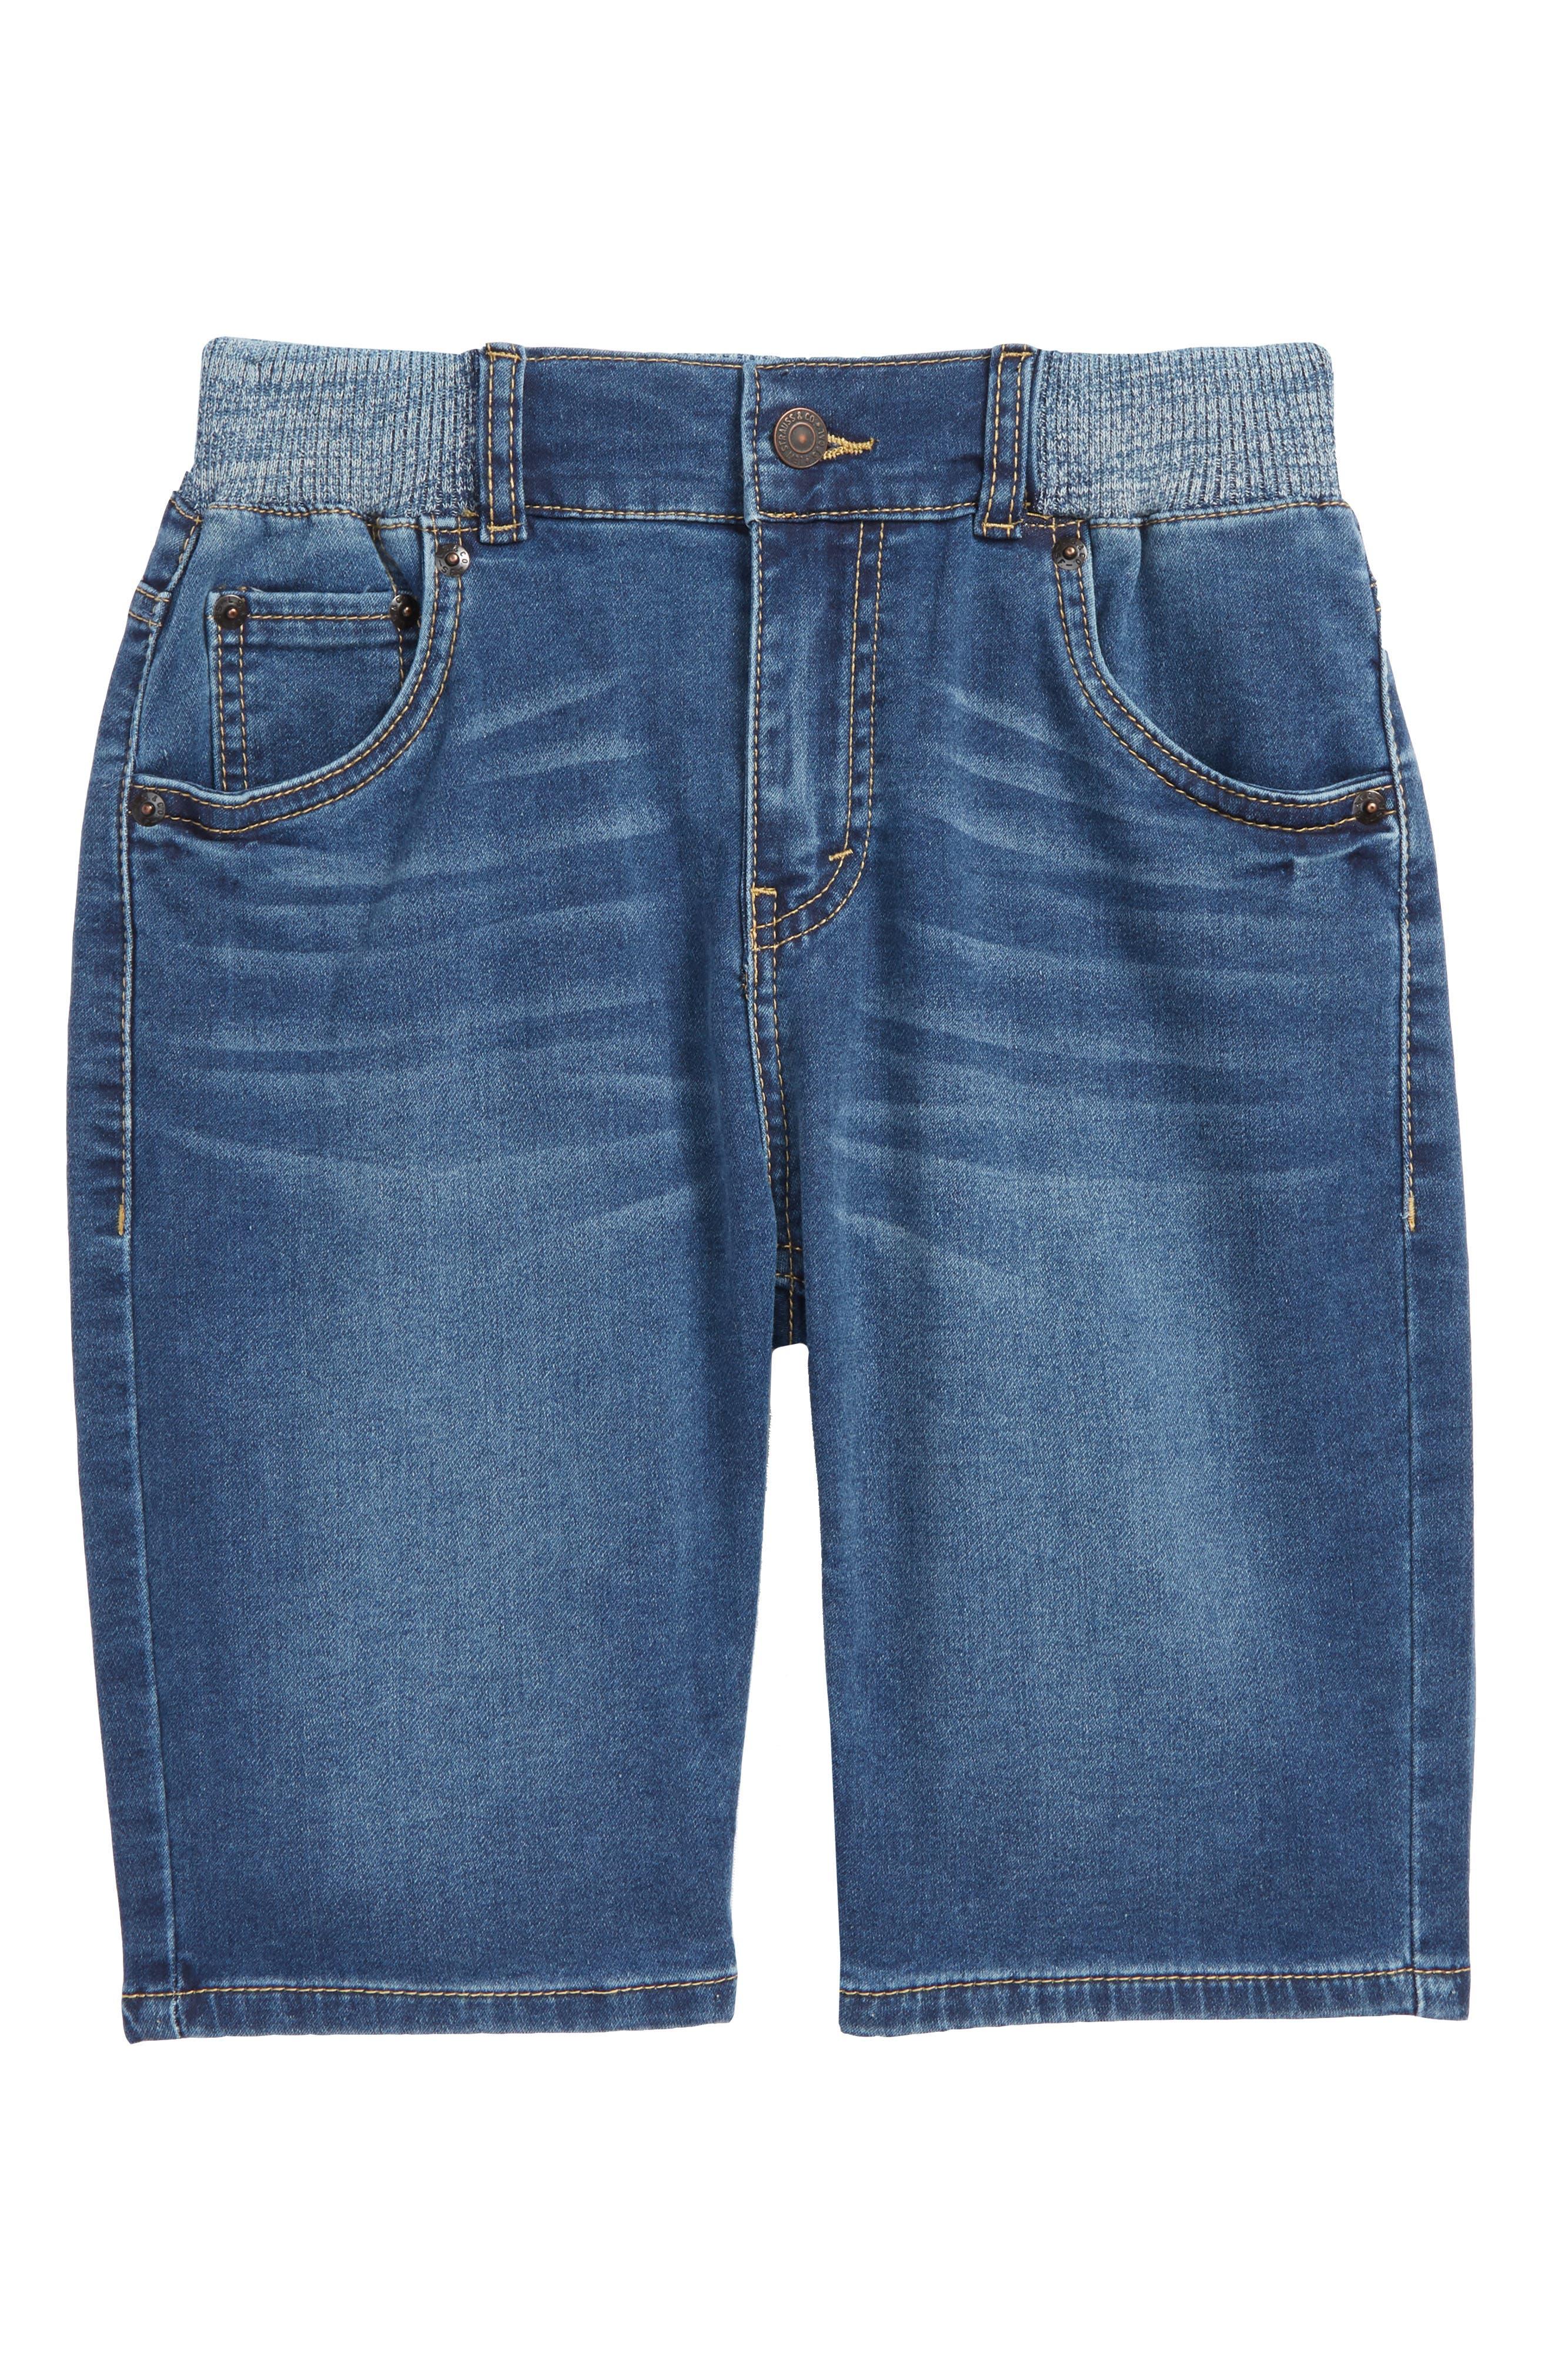 Levi's Super Chill Denim Shorts,                             Main thumbnail 1, color,                             Coastal Sd